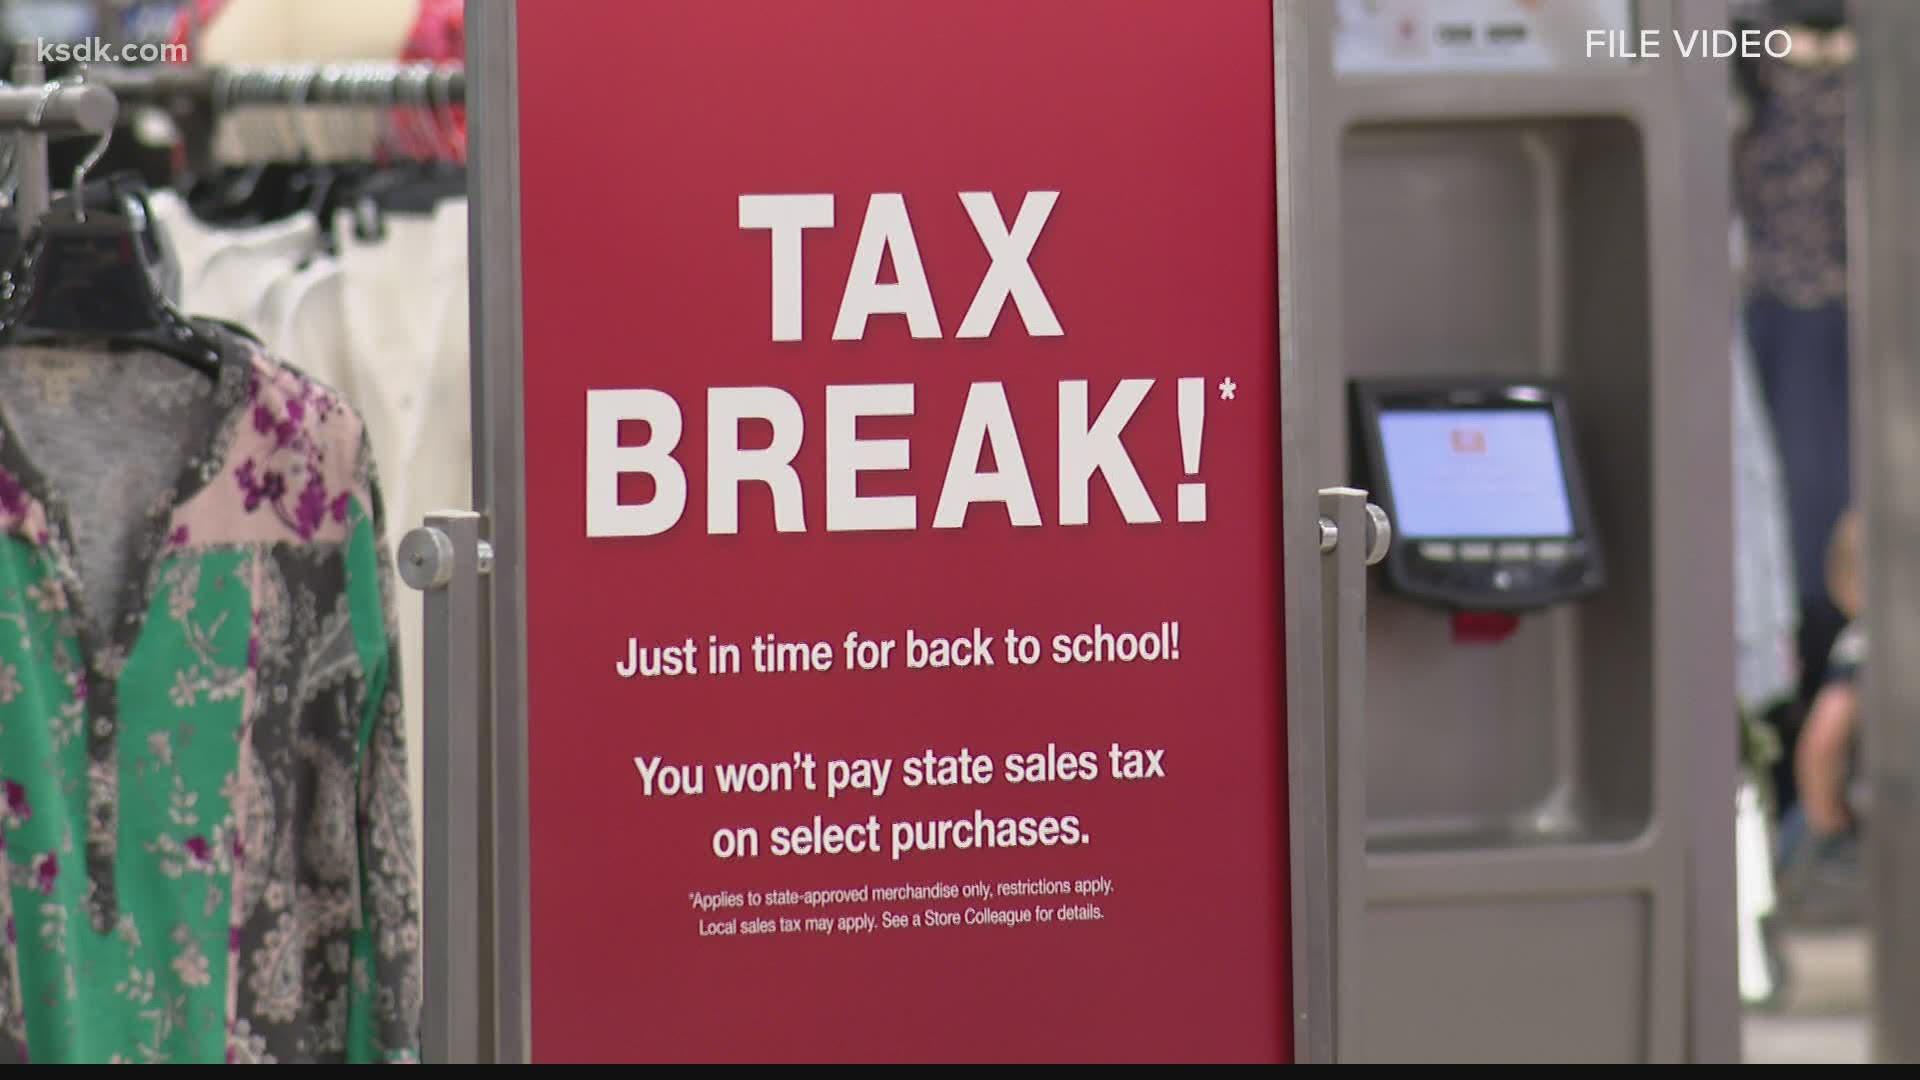 Missouri Tax Free Weekend Malls Extending Hours Wusa9 Com